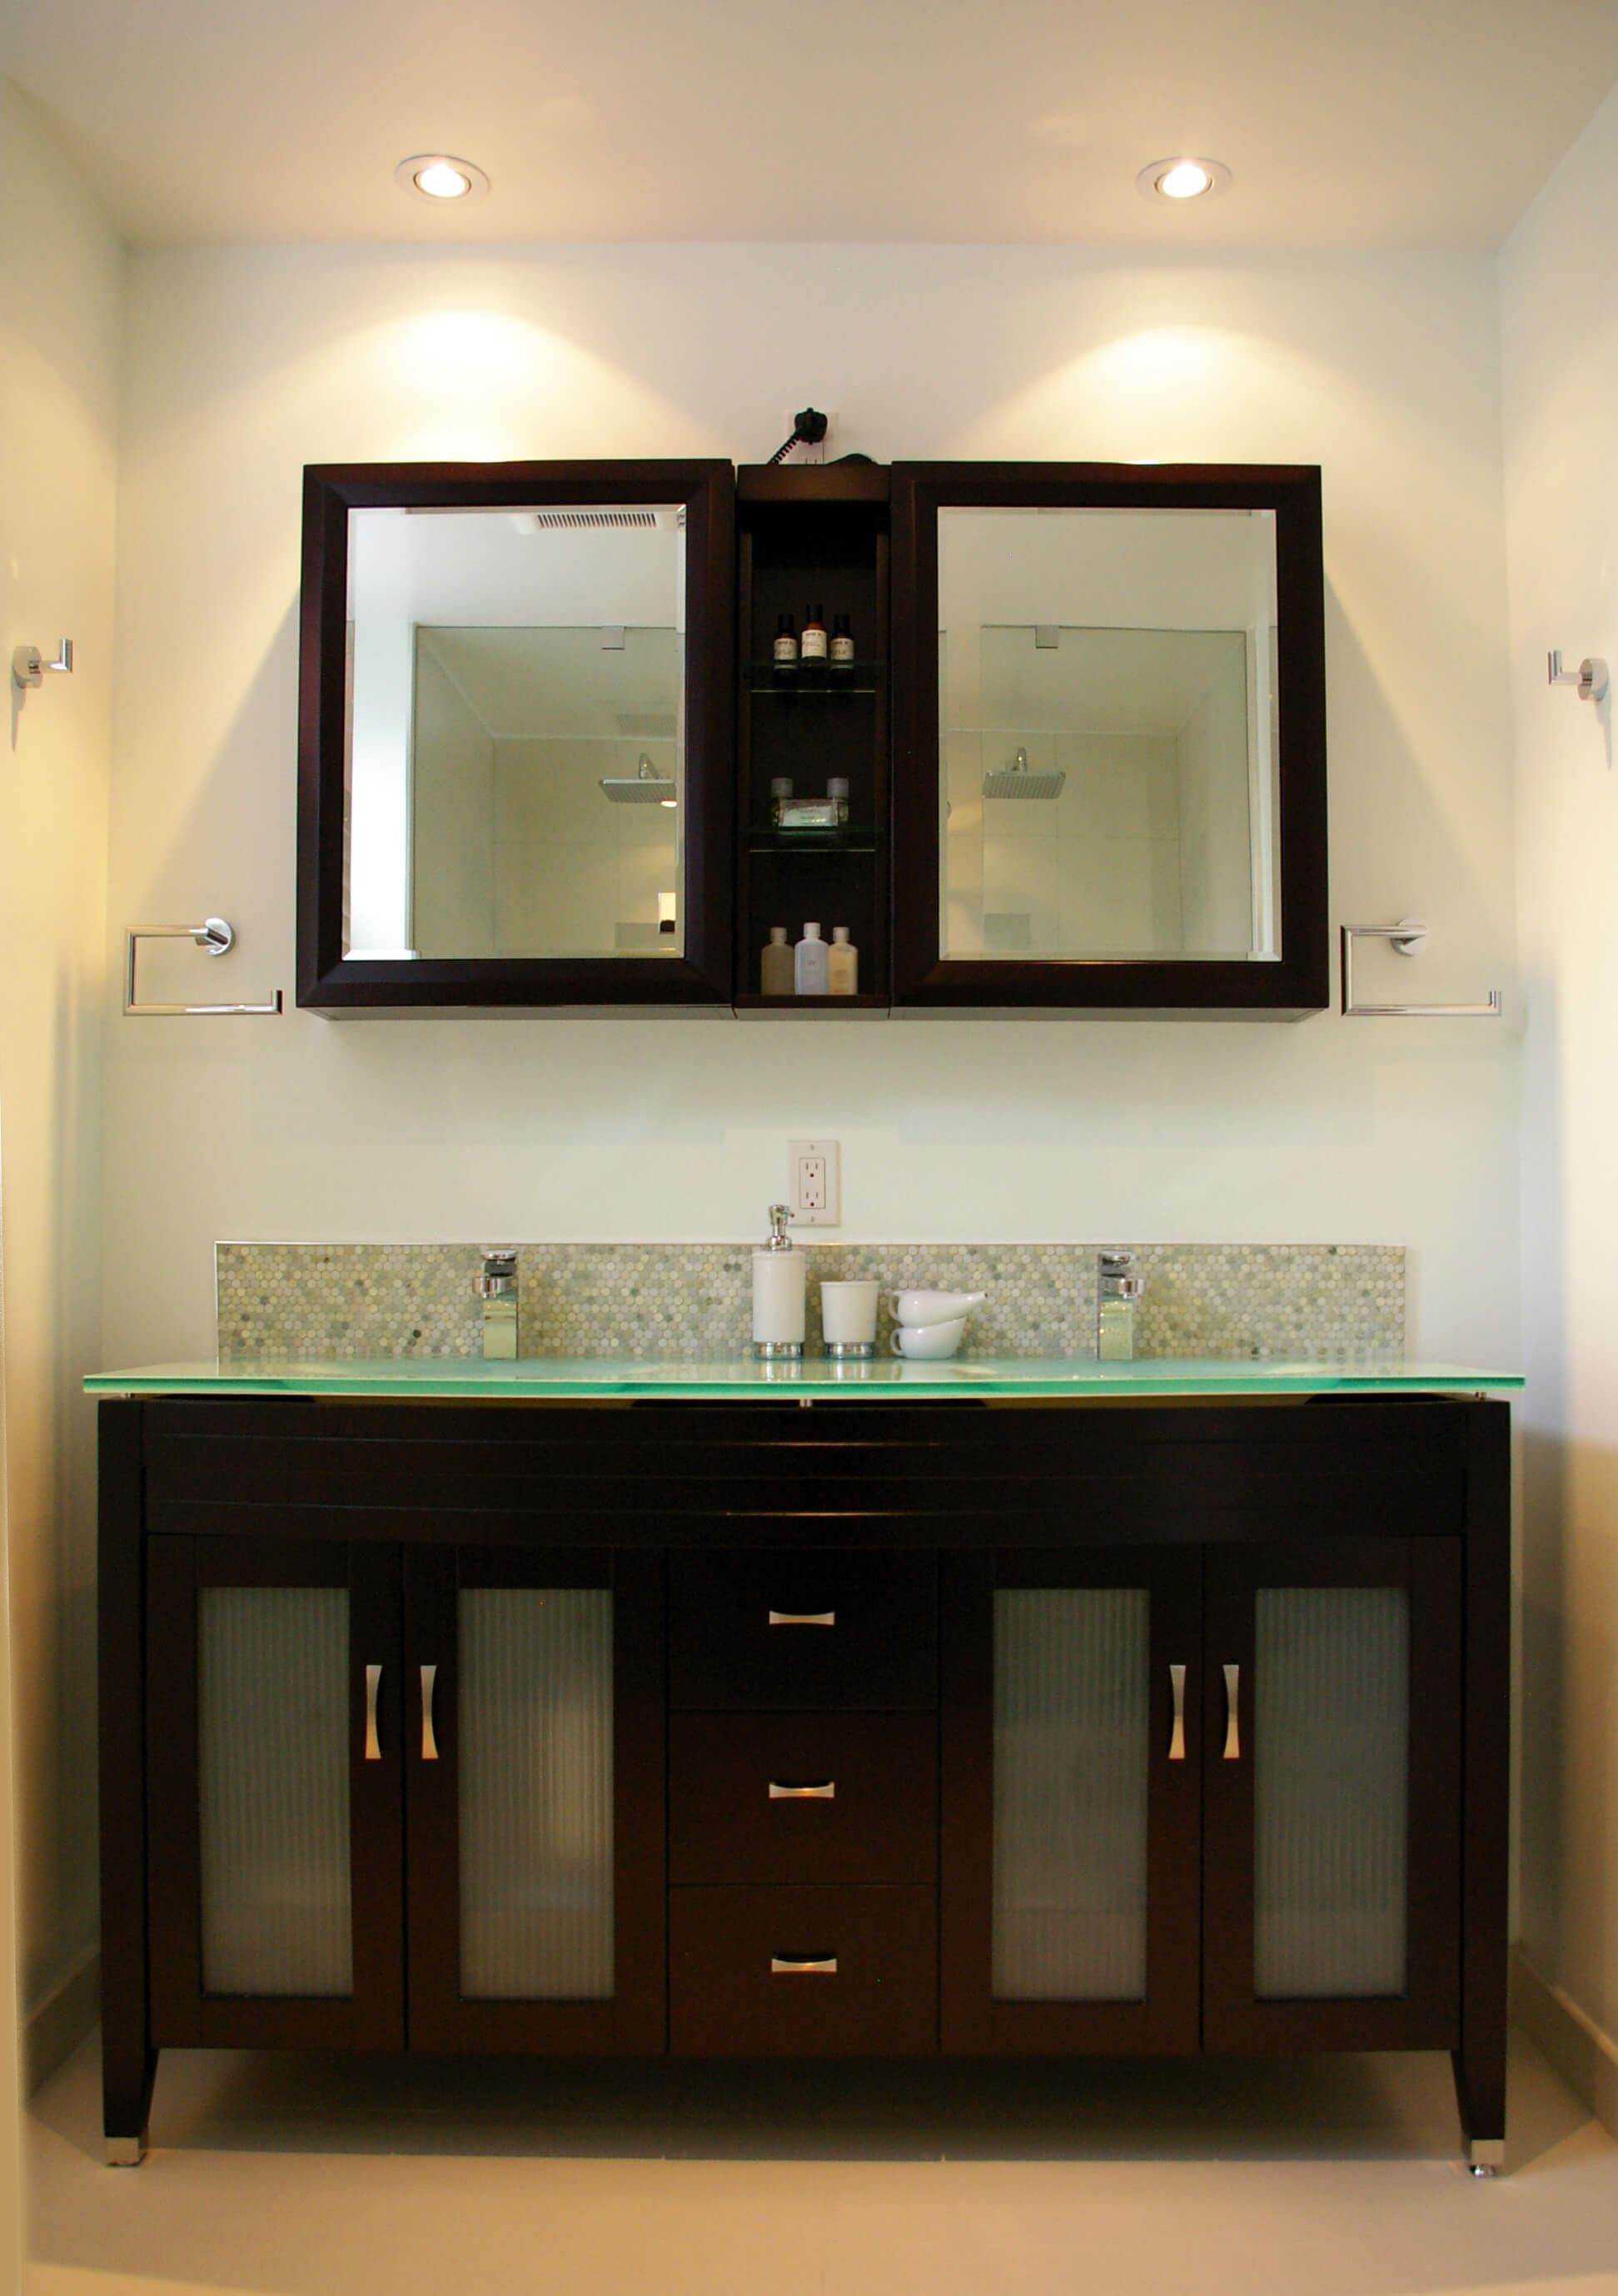 bathroom-renovation-ideas-vanity-2.jpg